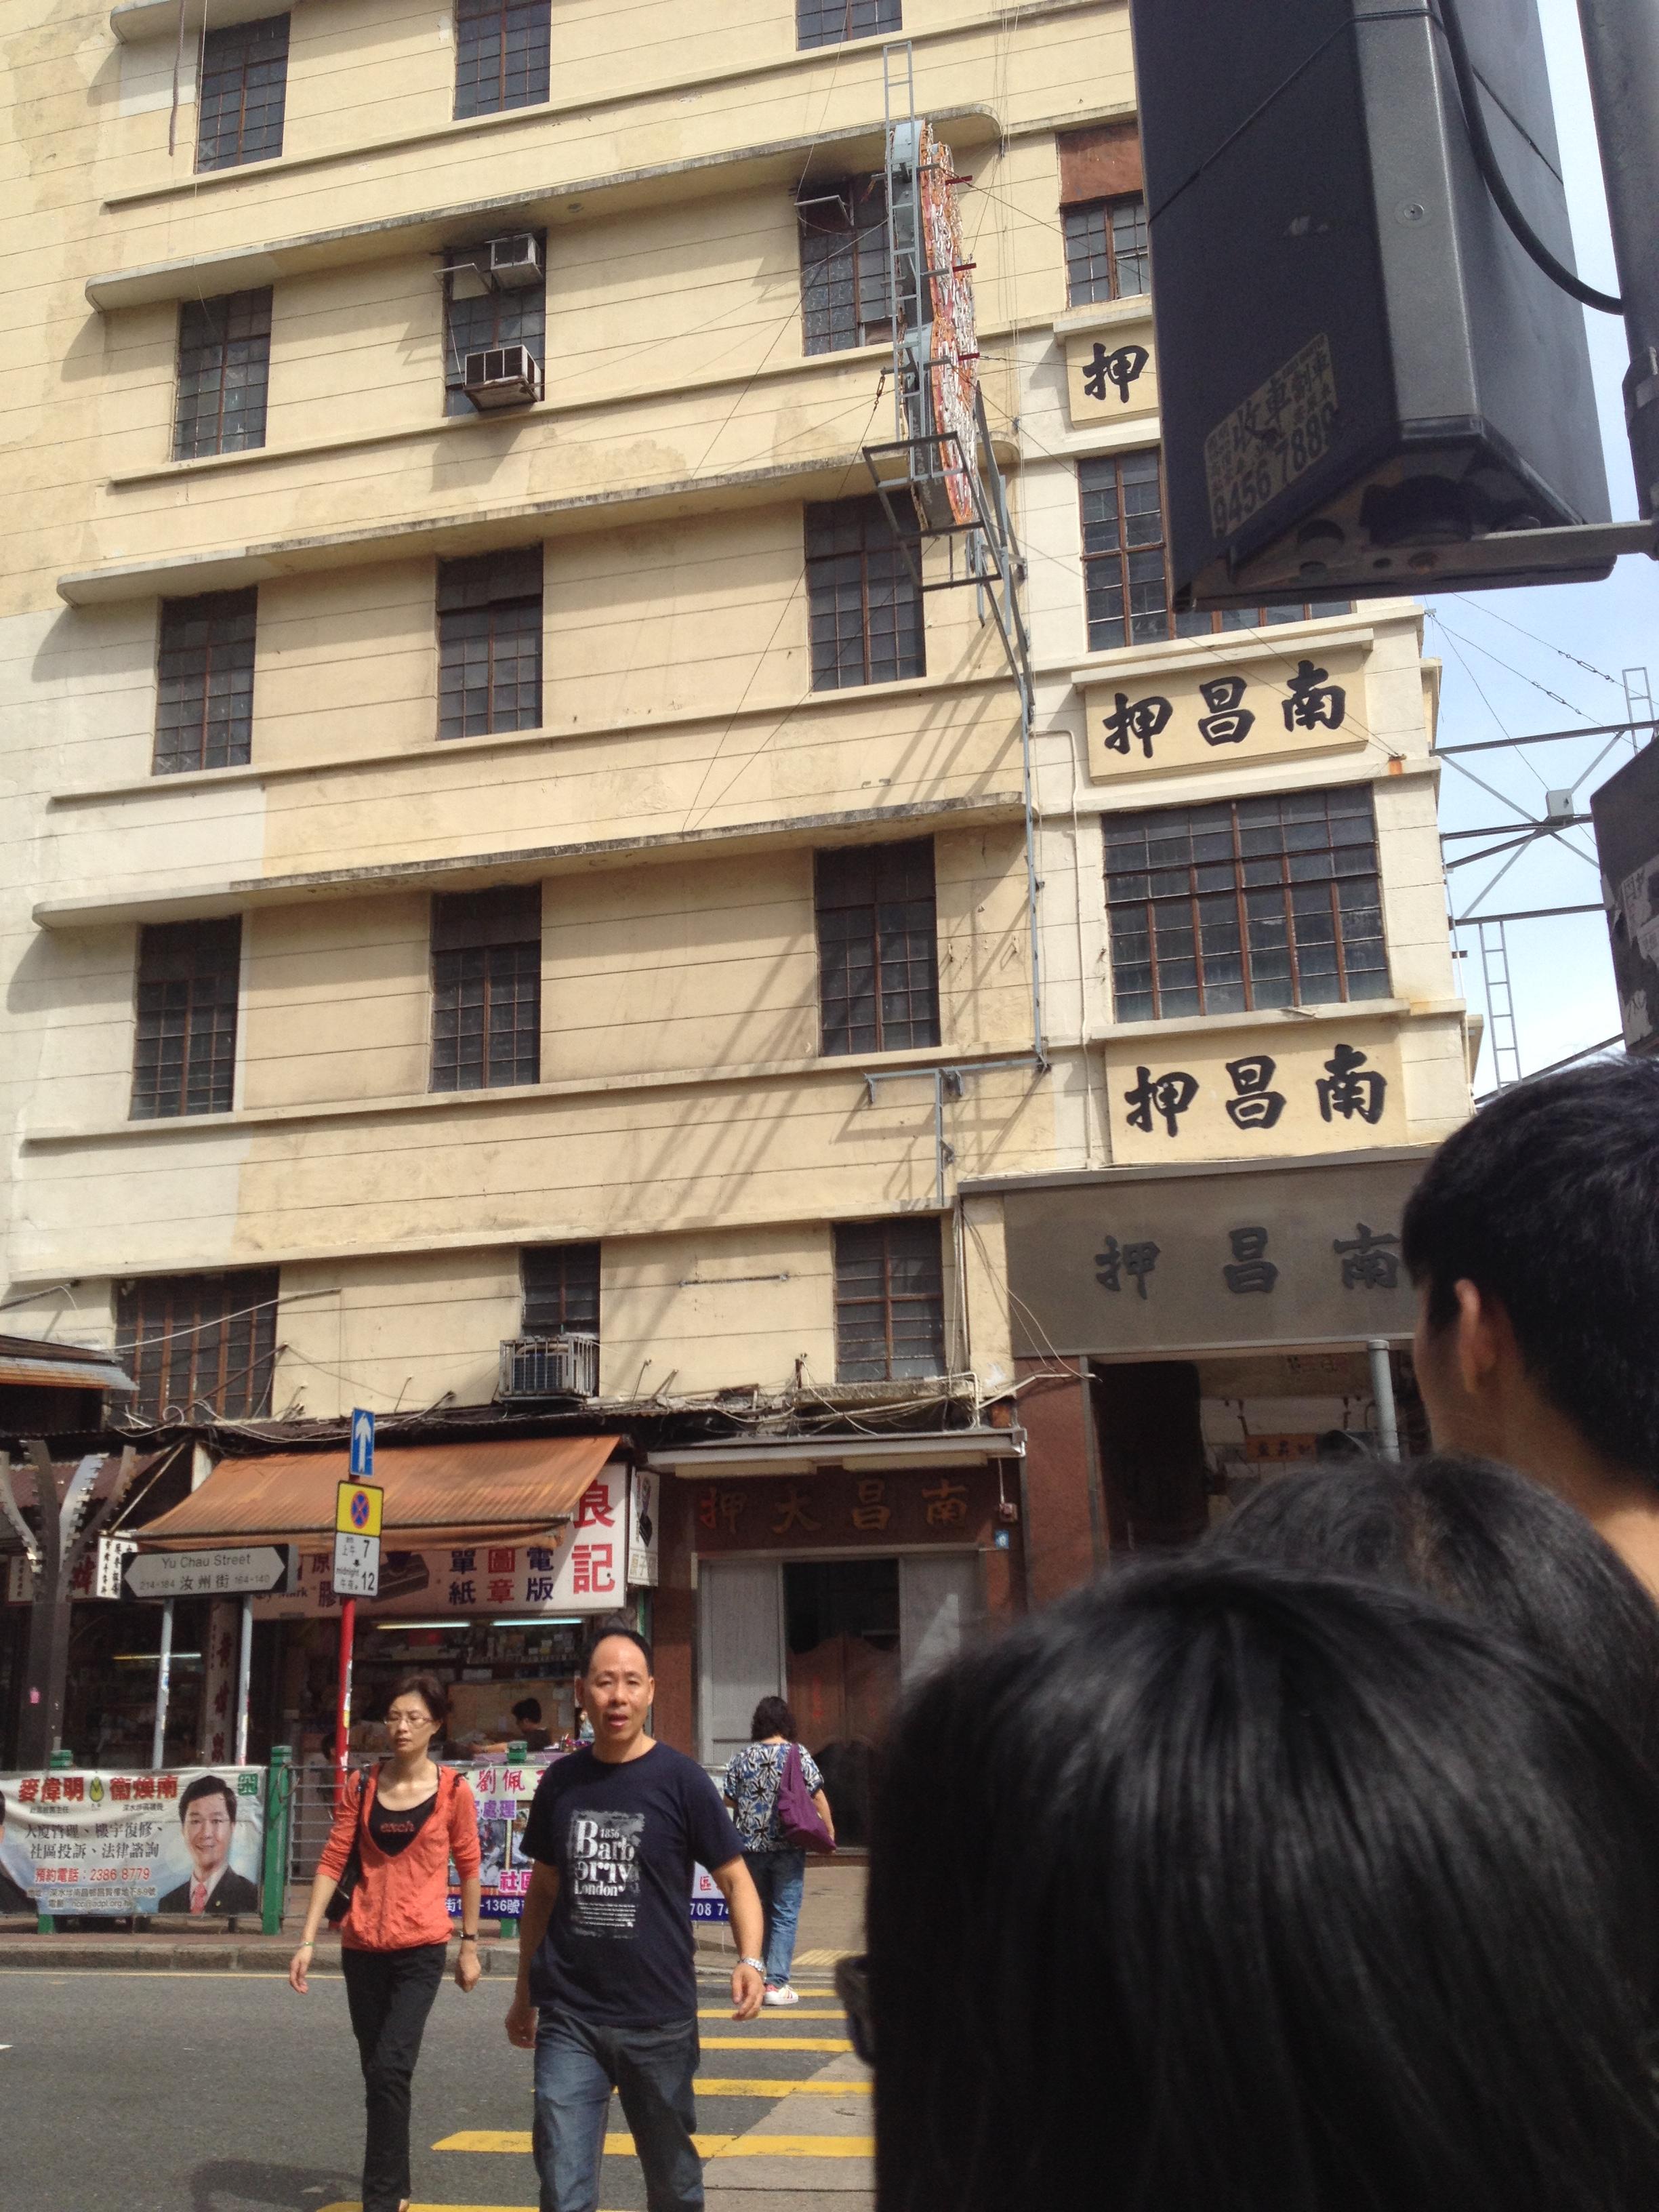 Pawnbrokers in Hong Kong - Wikipedia